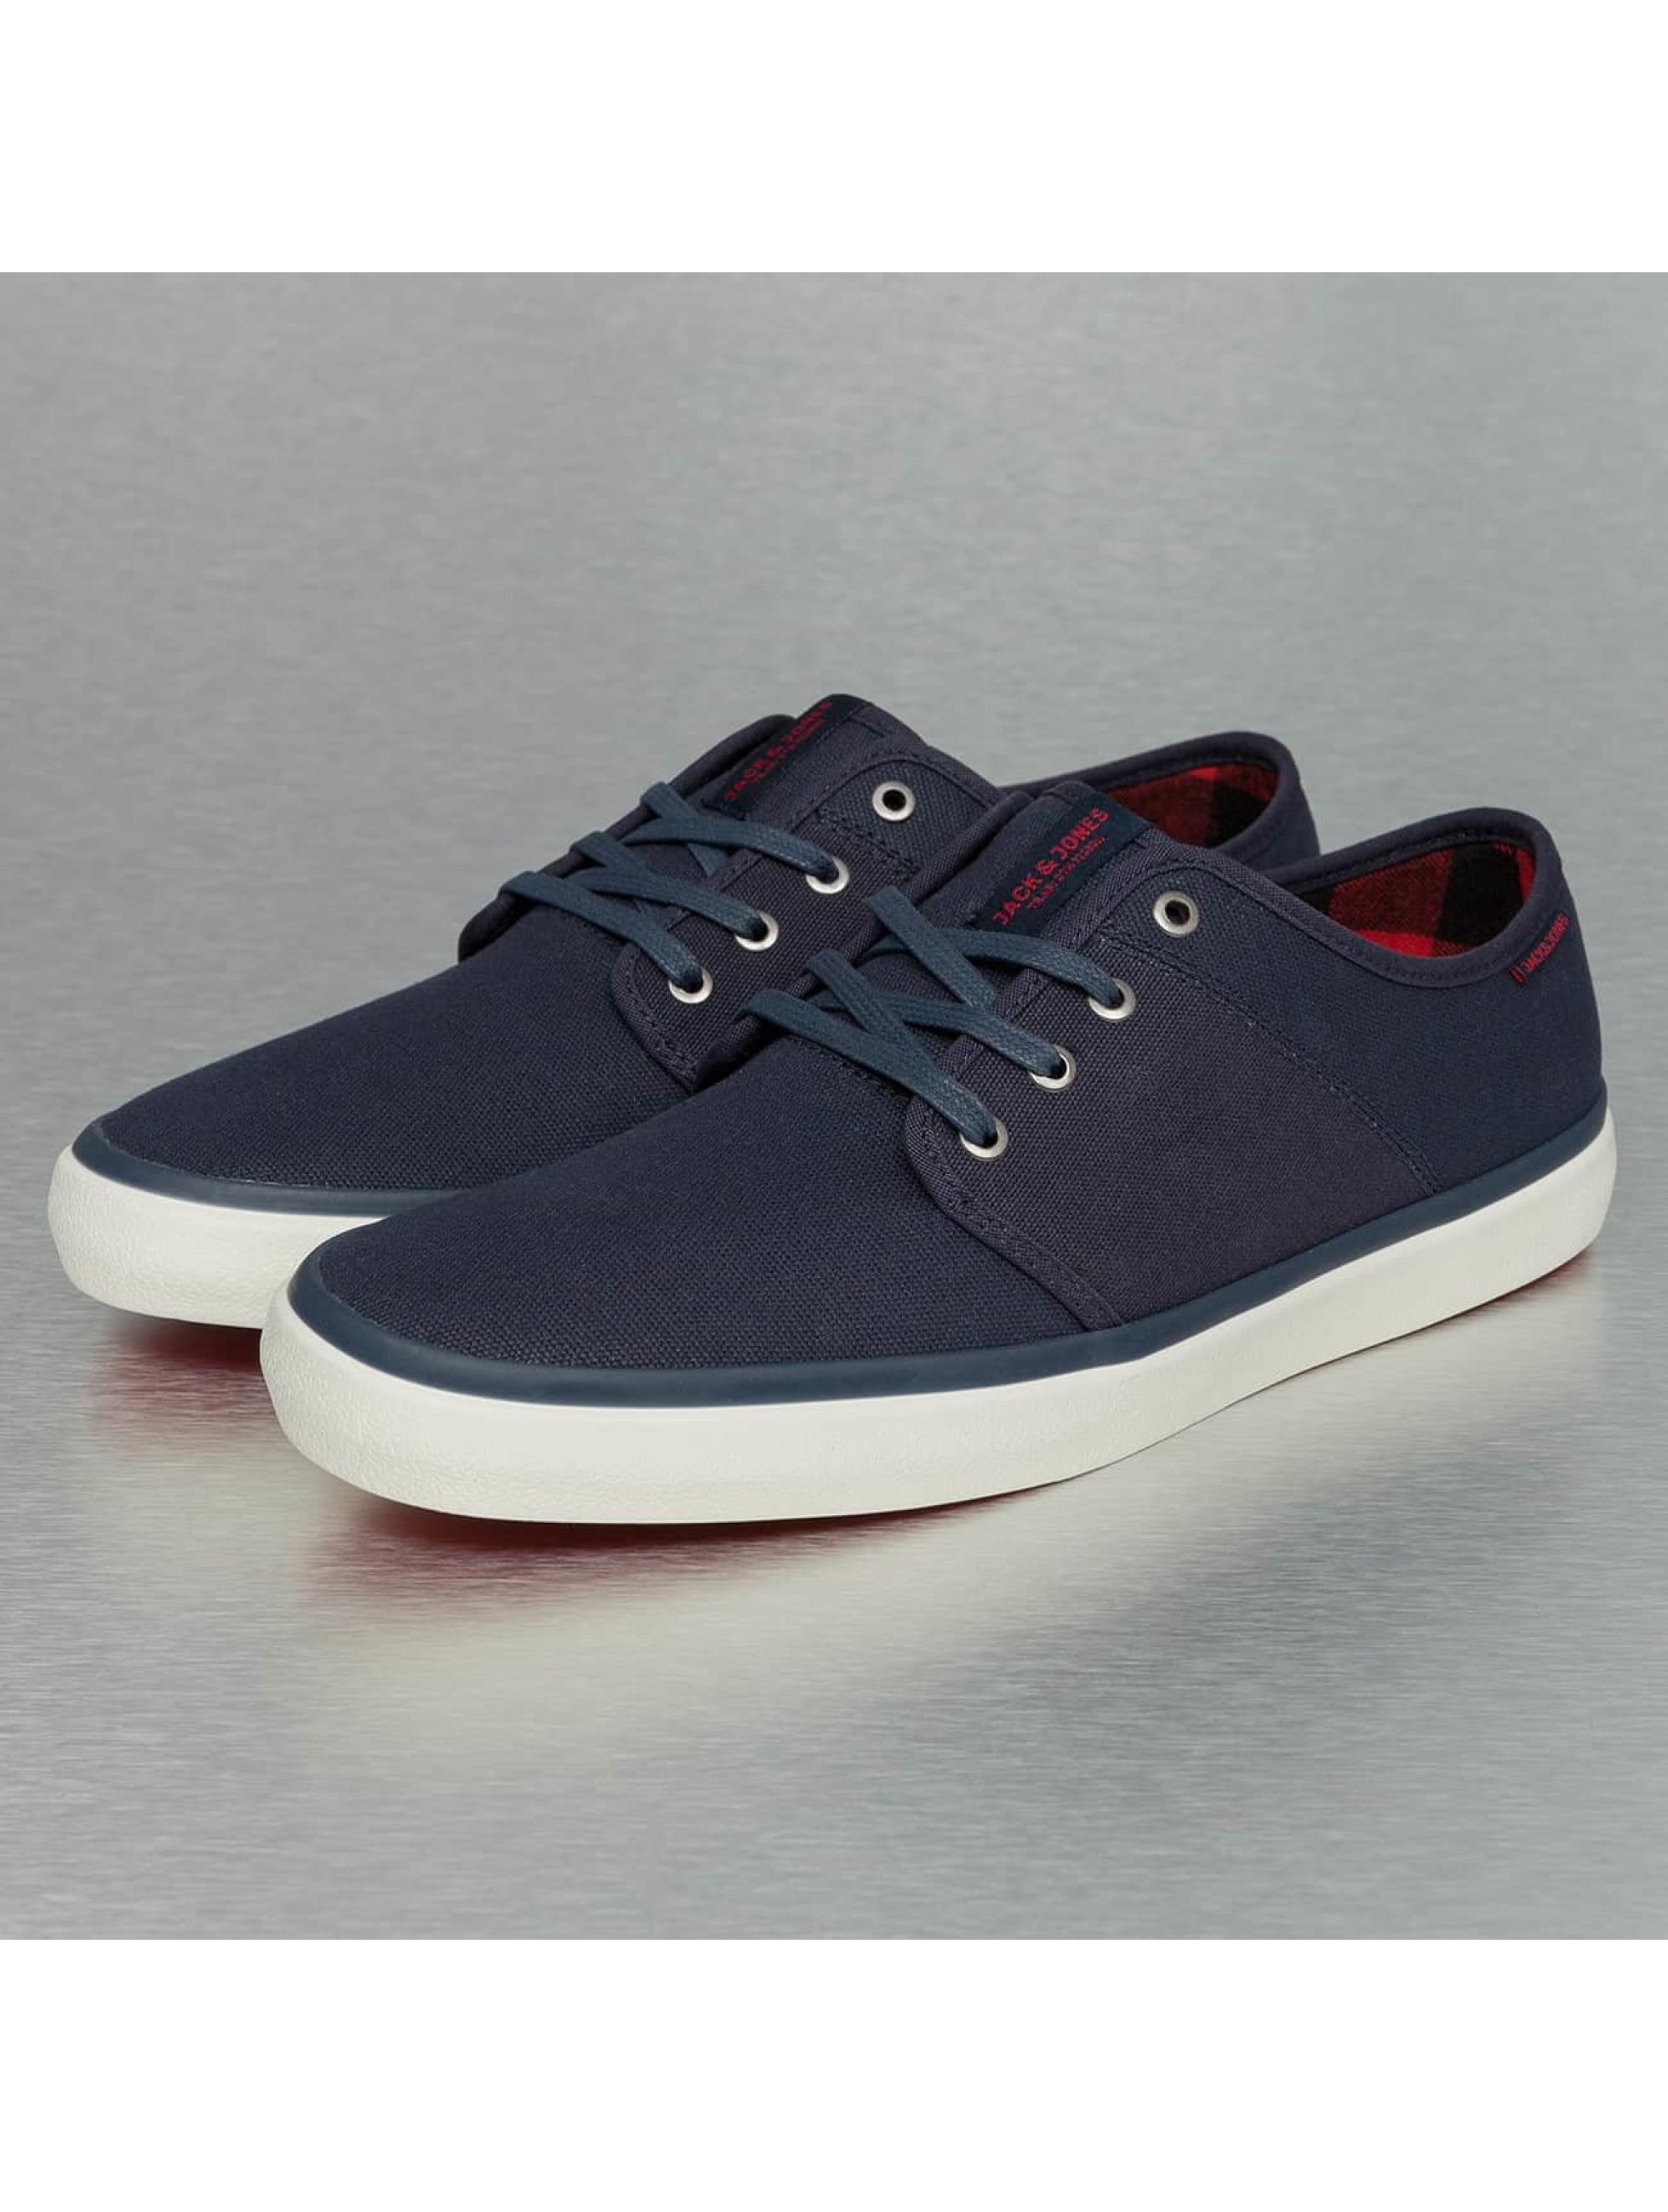 Jack & Jones Männer Sneaker jfwTurbo Waxed Canvas in blau Sale Angebote Laubsdorf